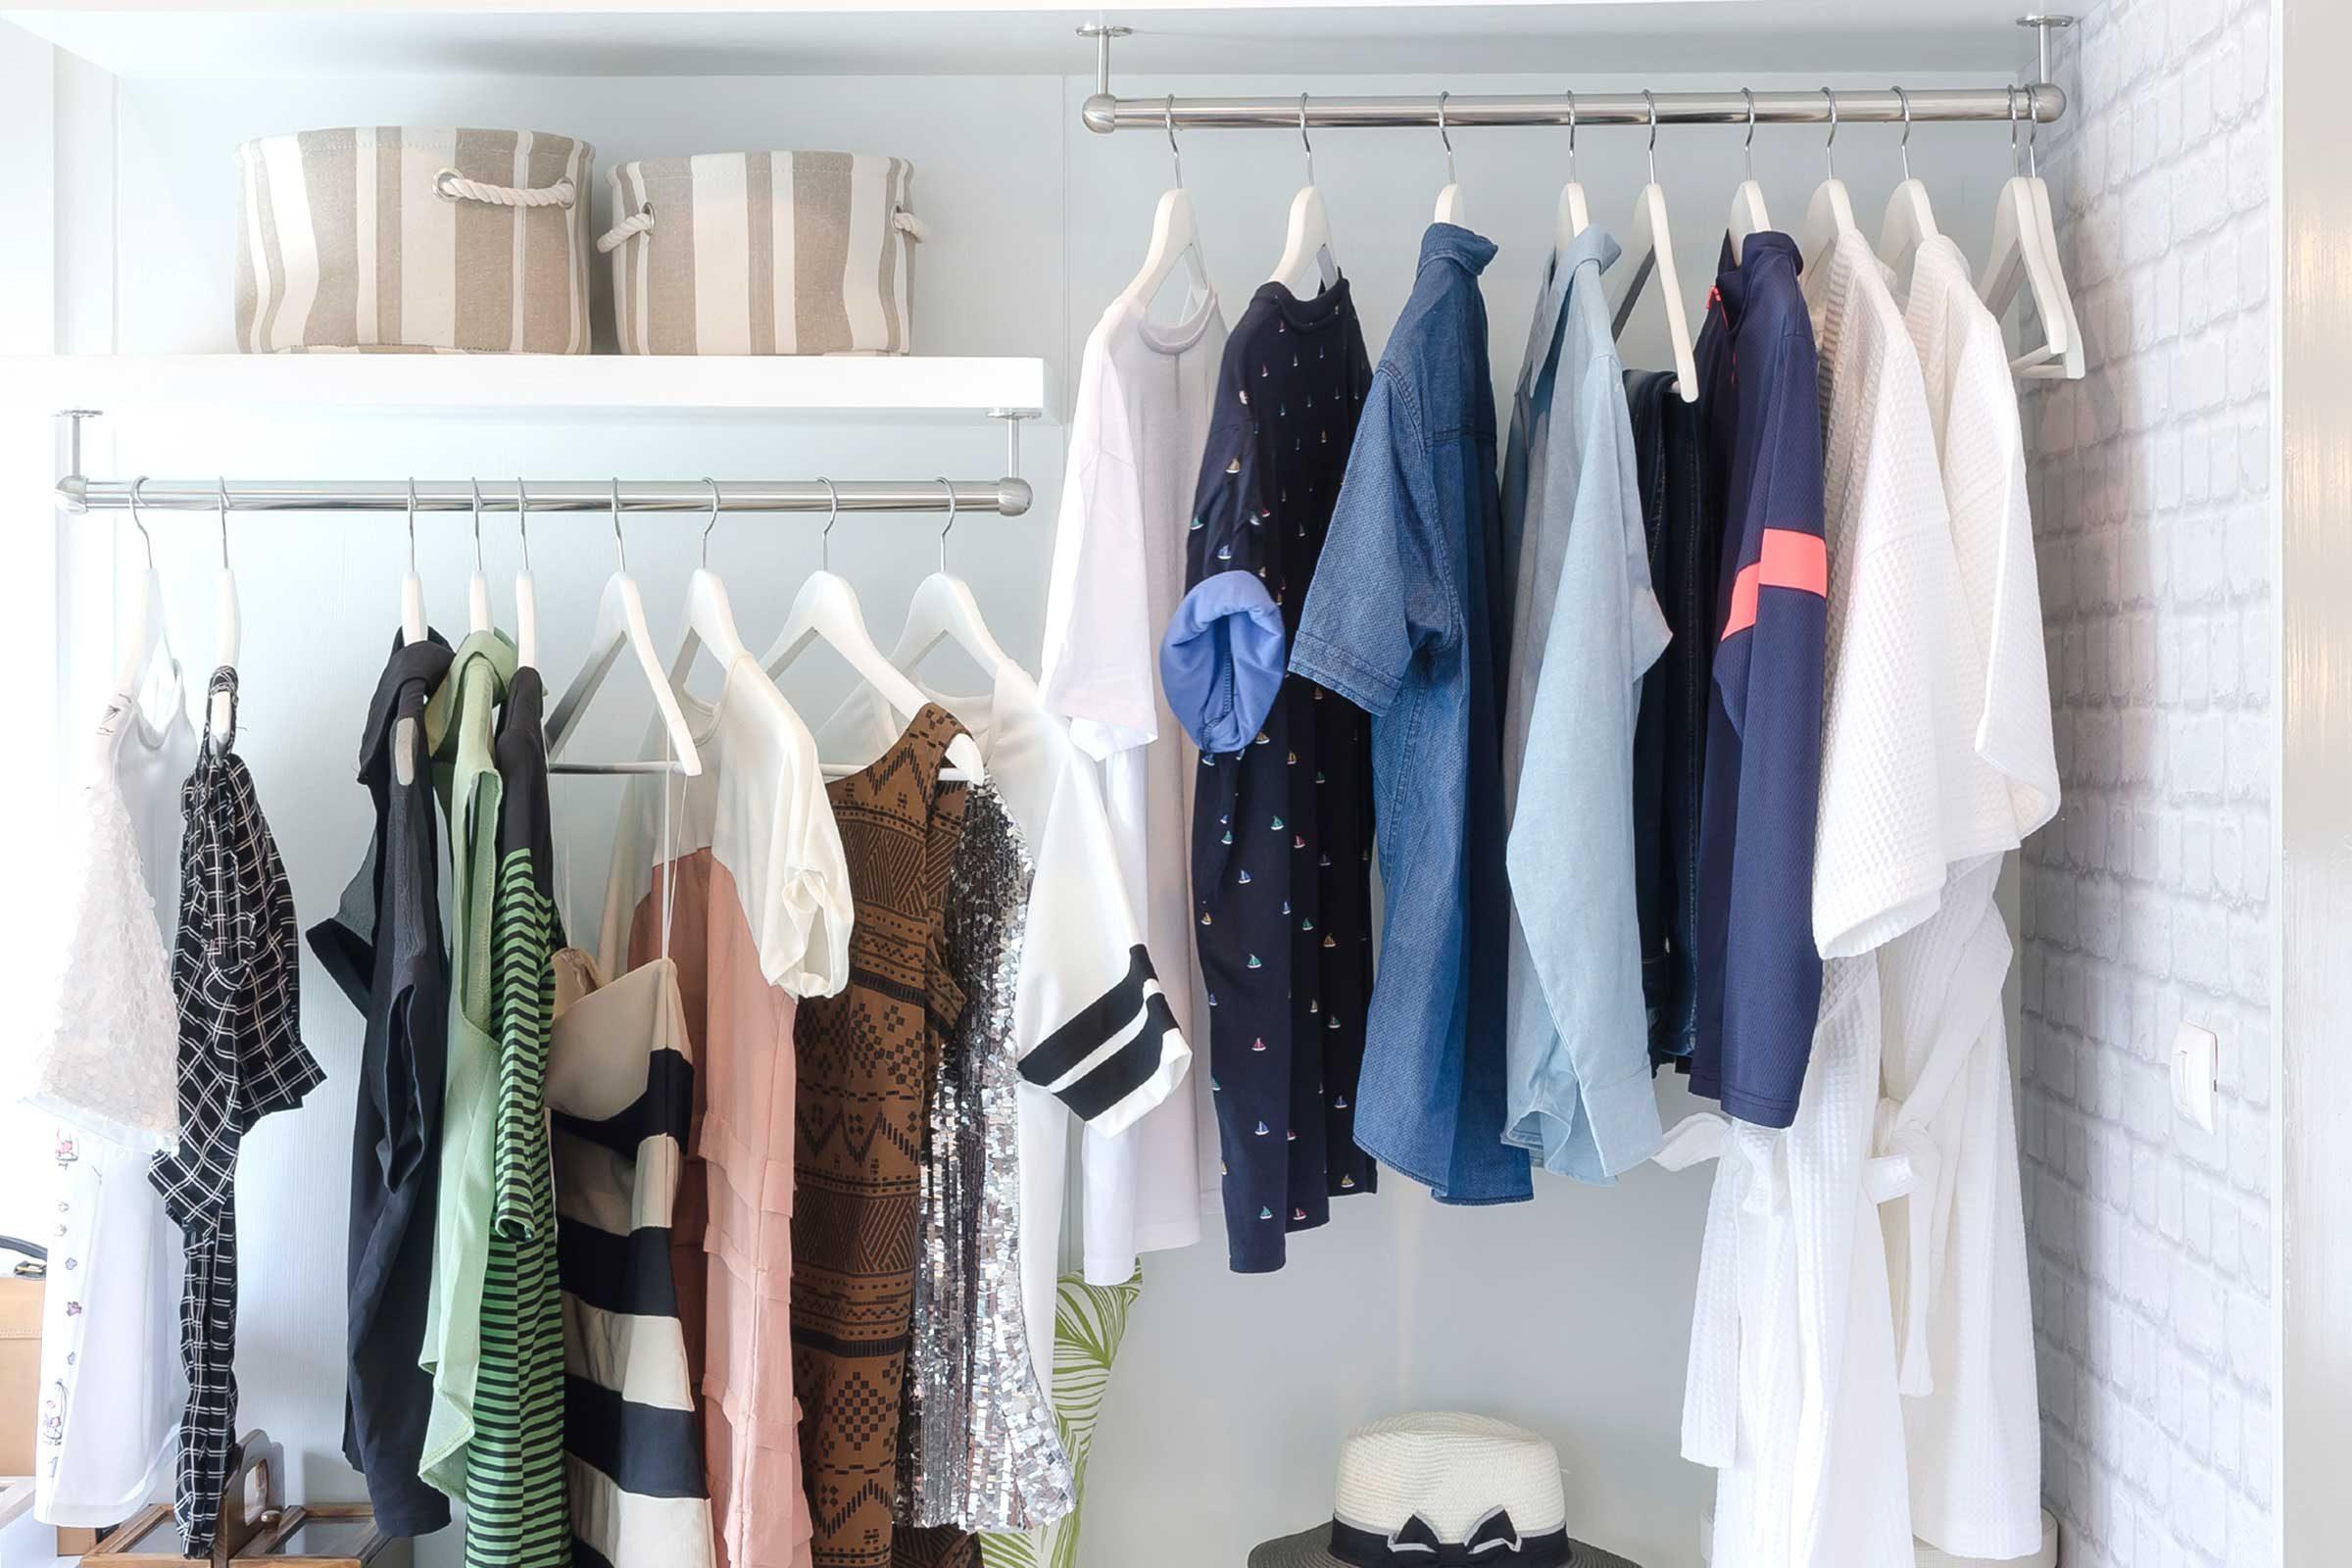 Squeeze More... Clothes into a closet